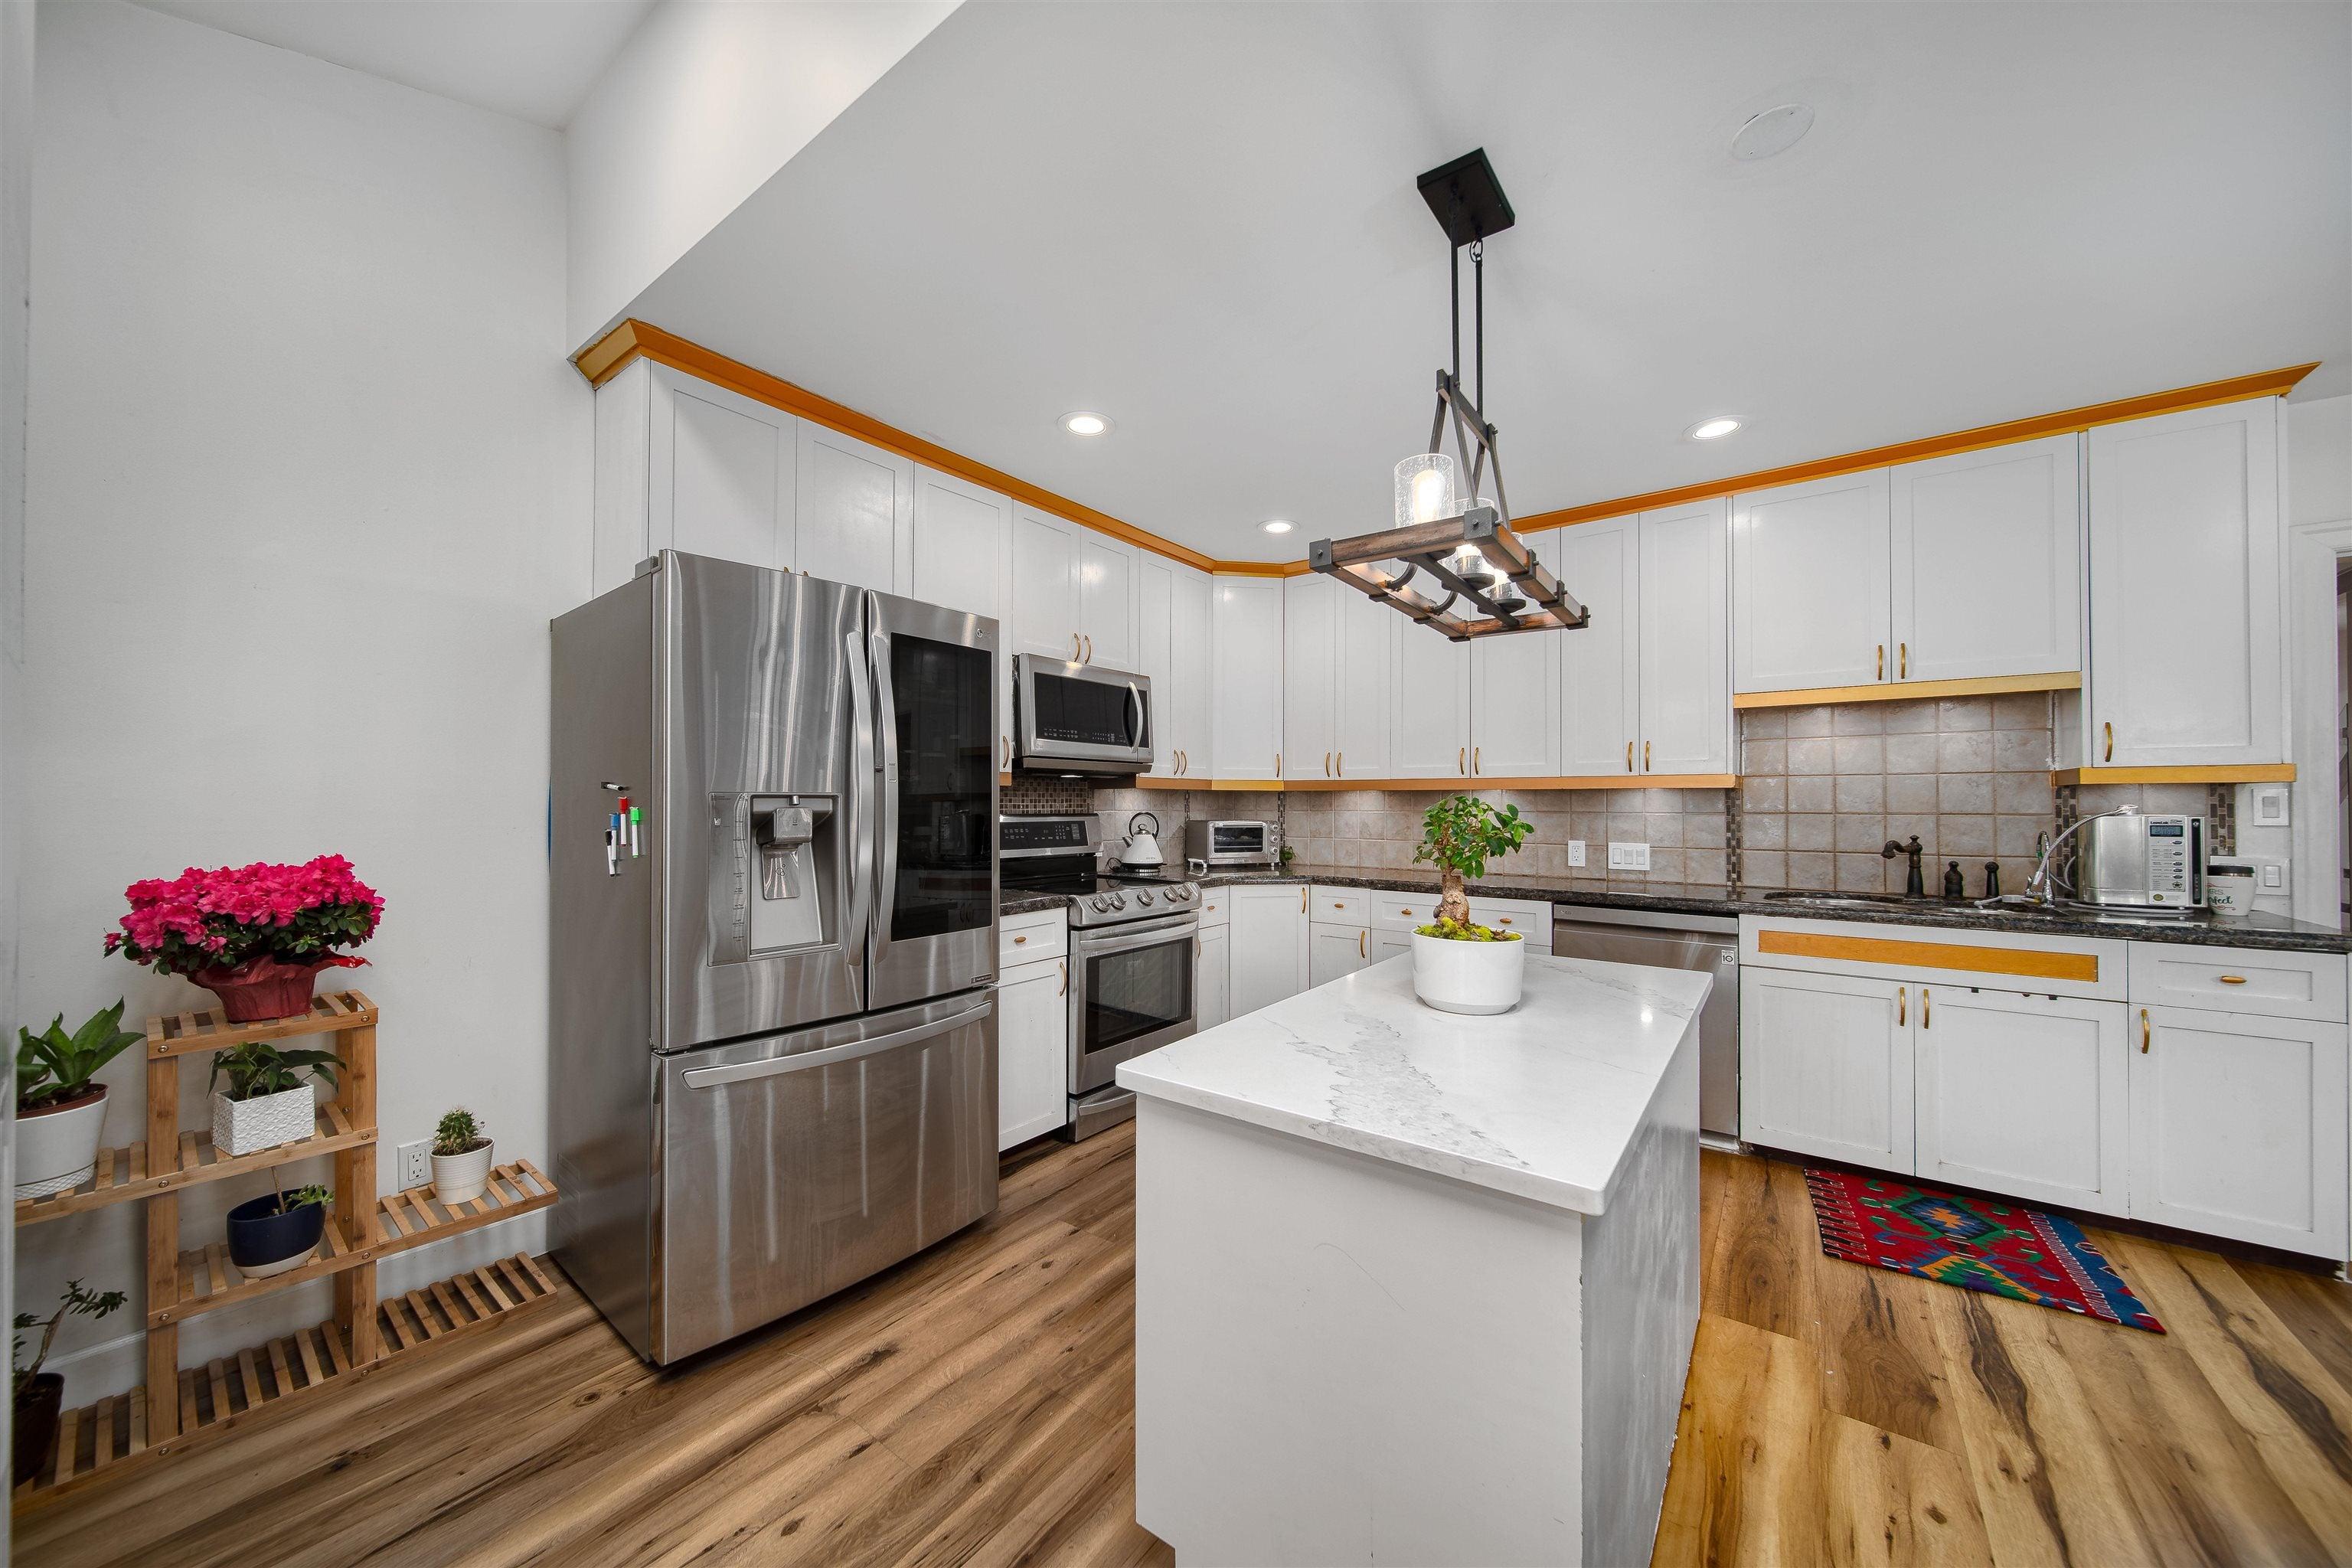 1357 FULTON AVENUE - Ambleside House/Single Family for sale, 6 Bedrooms (R2617731) - #15